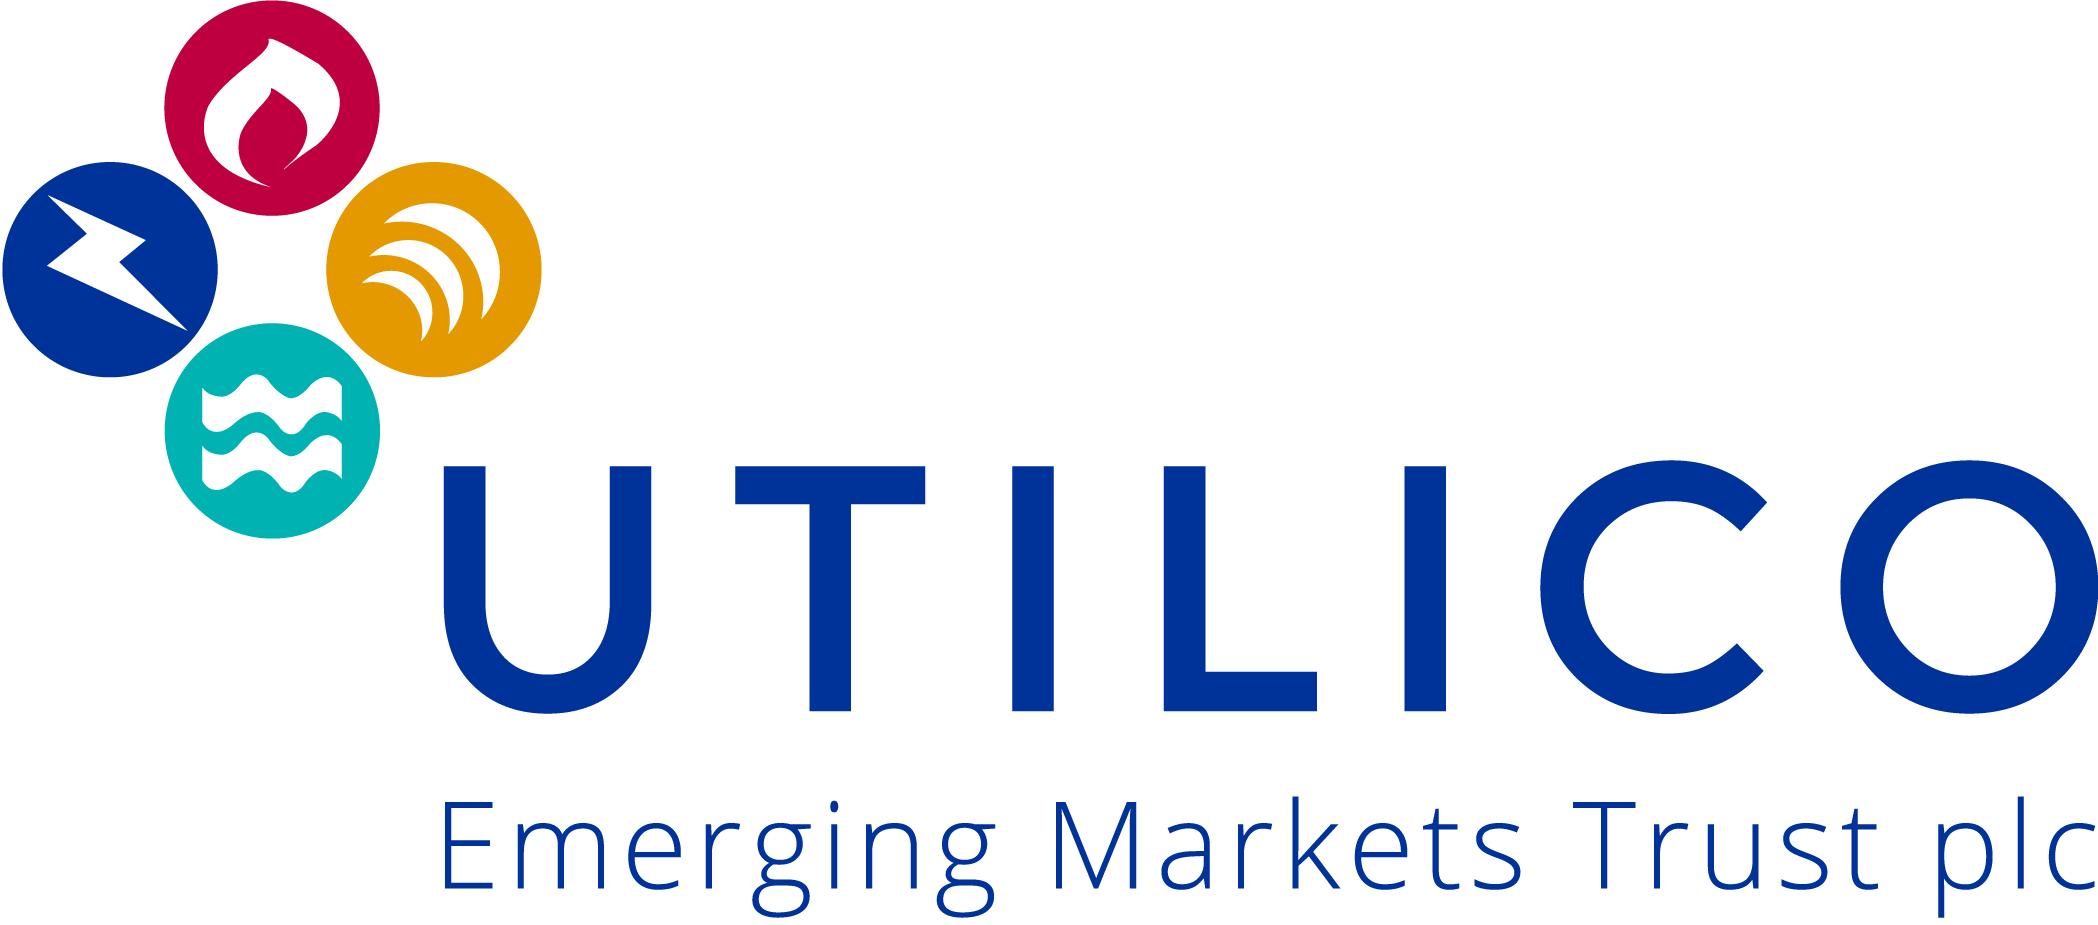 UTILICO EMERGING MARKETS TRUST PLC Logo